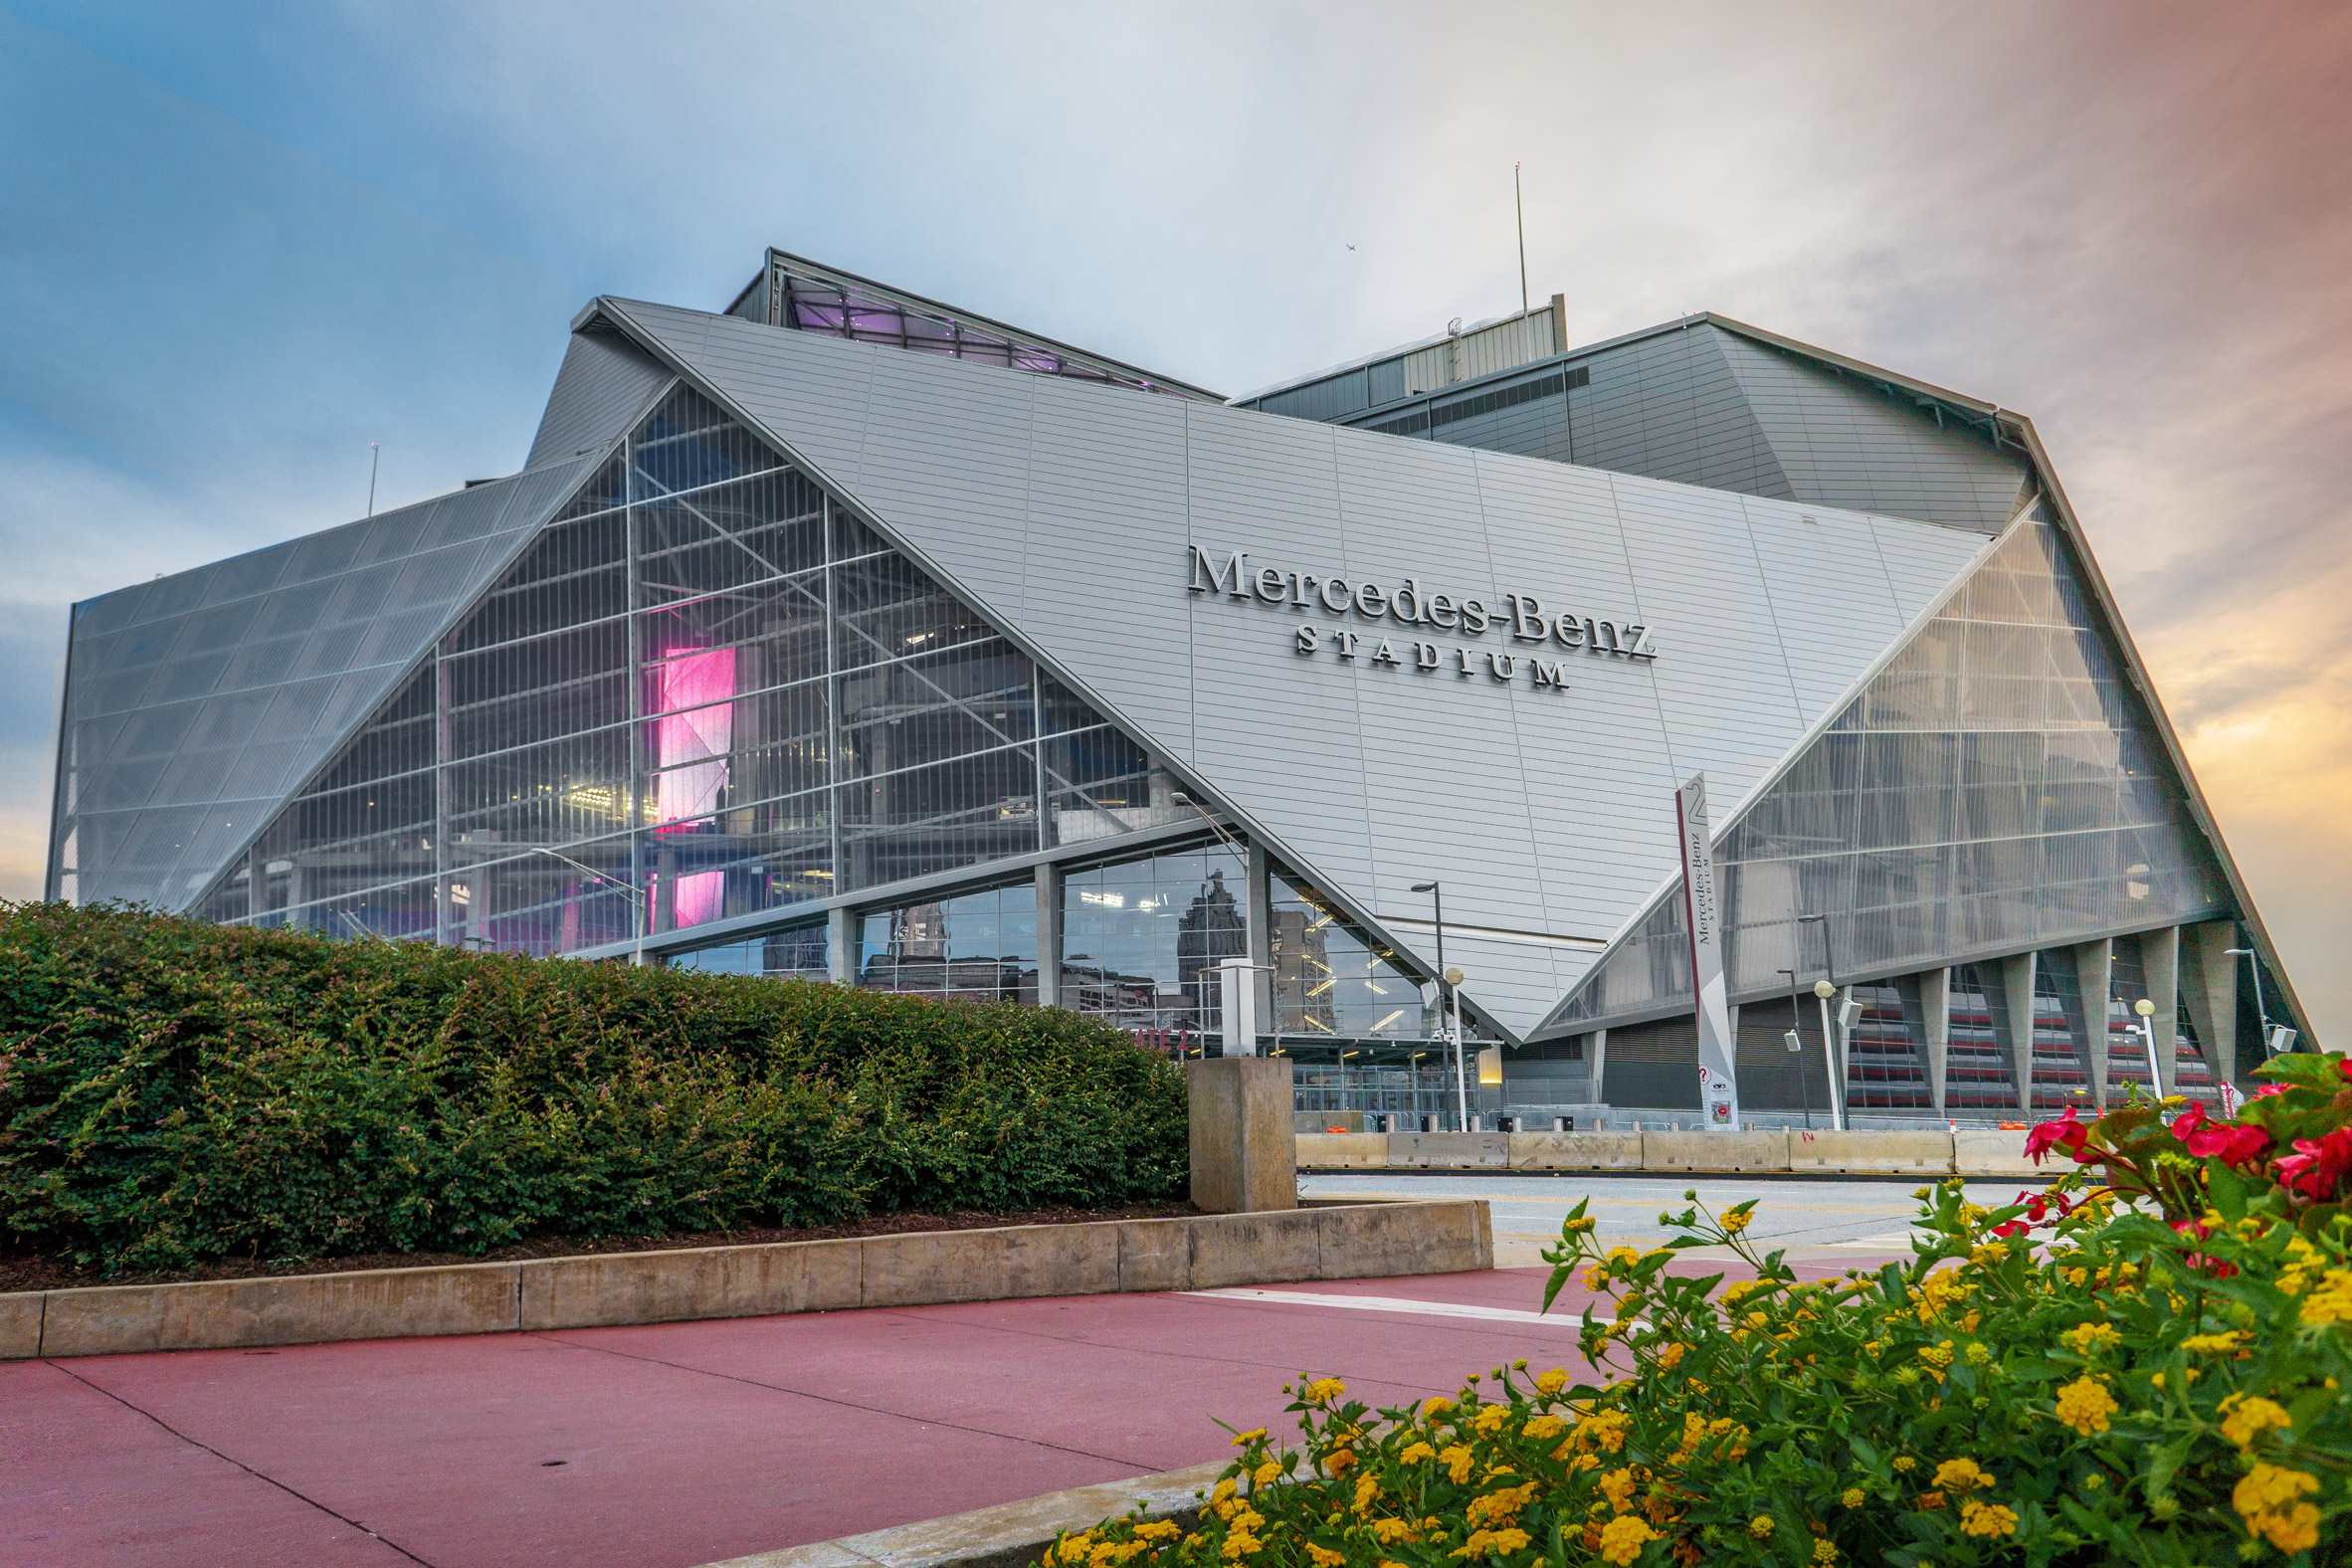 Atlanta stadium by hok hosts american football games under for Mercedes benz stadium in atlanta georgia